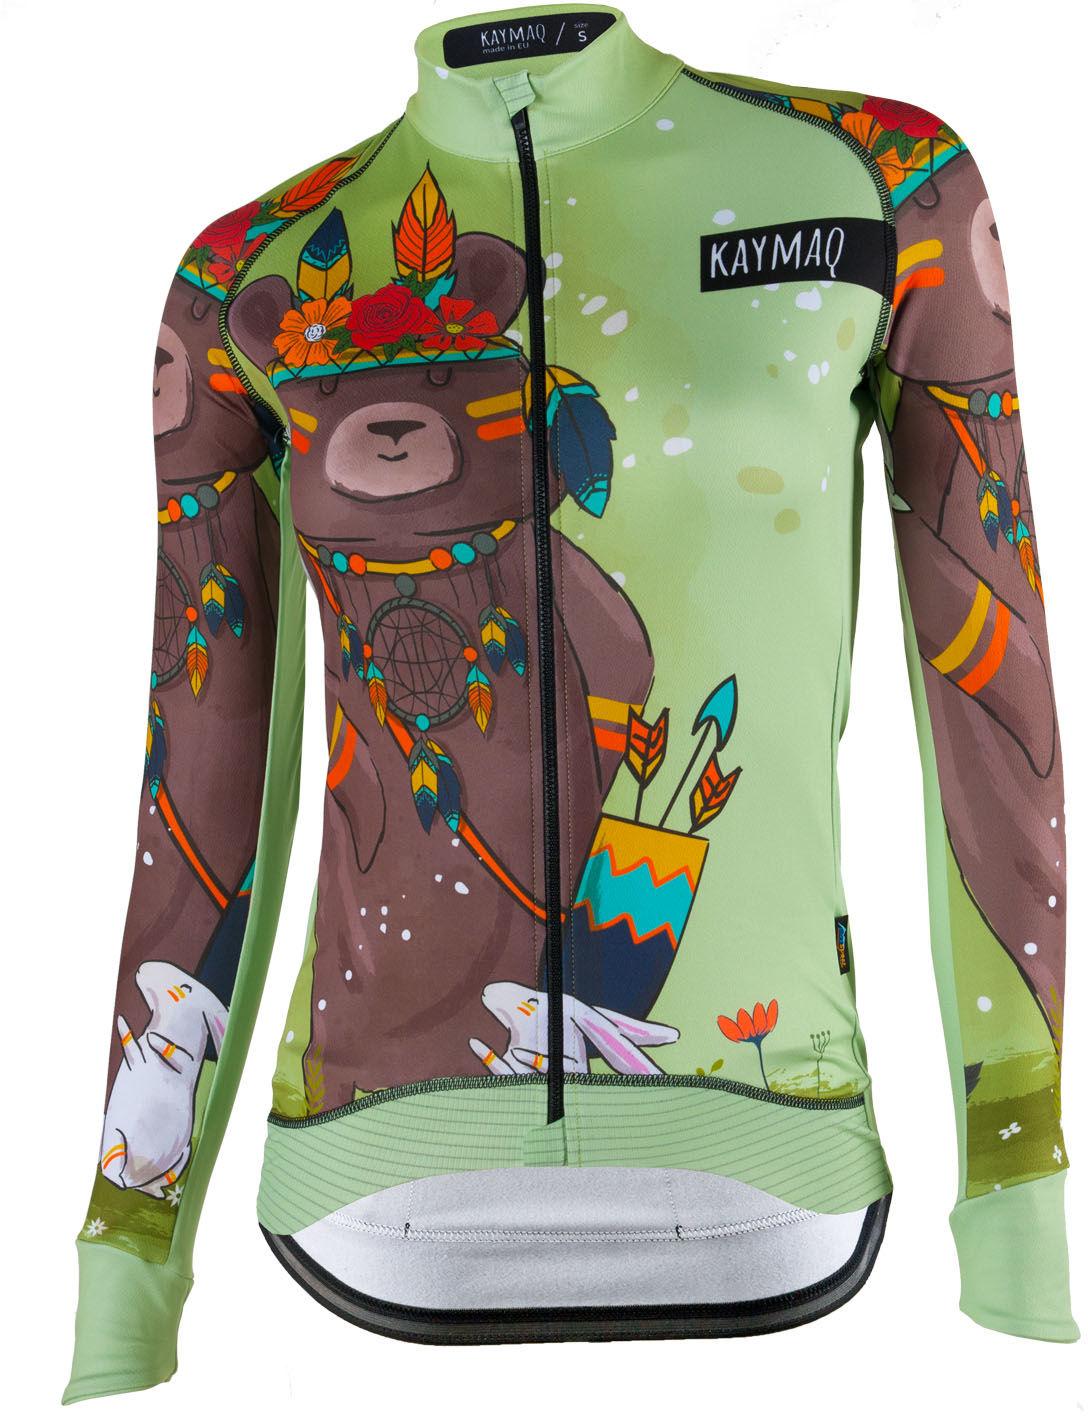 KAYMAQ DESIGN W12 damska bluza rowerowa Rozmiar: S,KMQ-W12